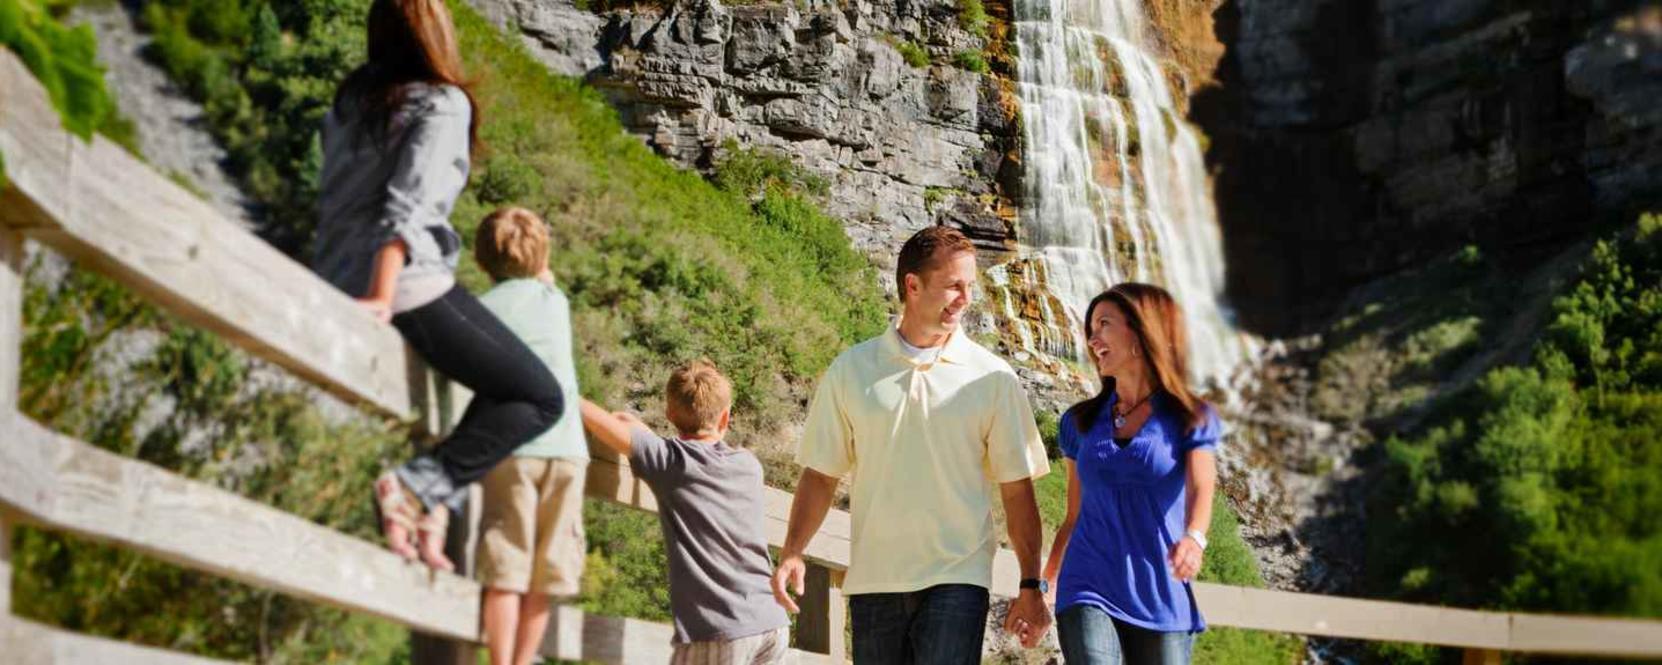 Day Trips & Itineraries | Explore Utah Valley